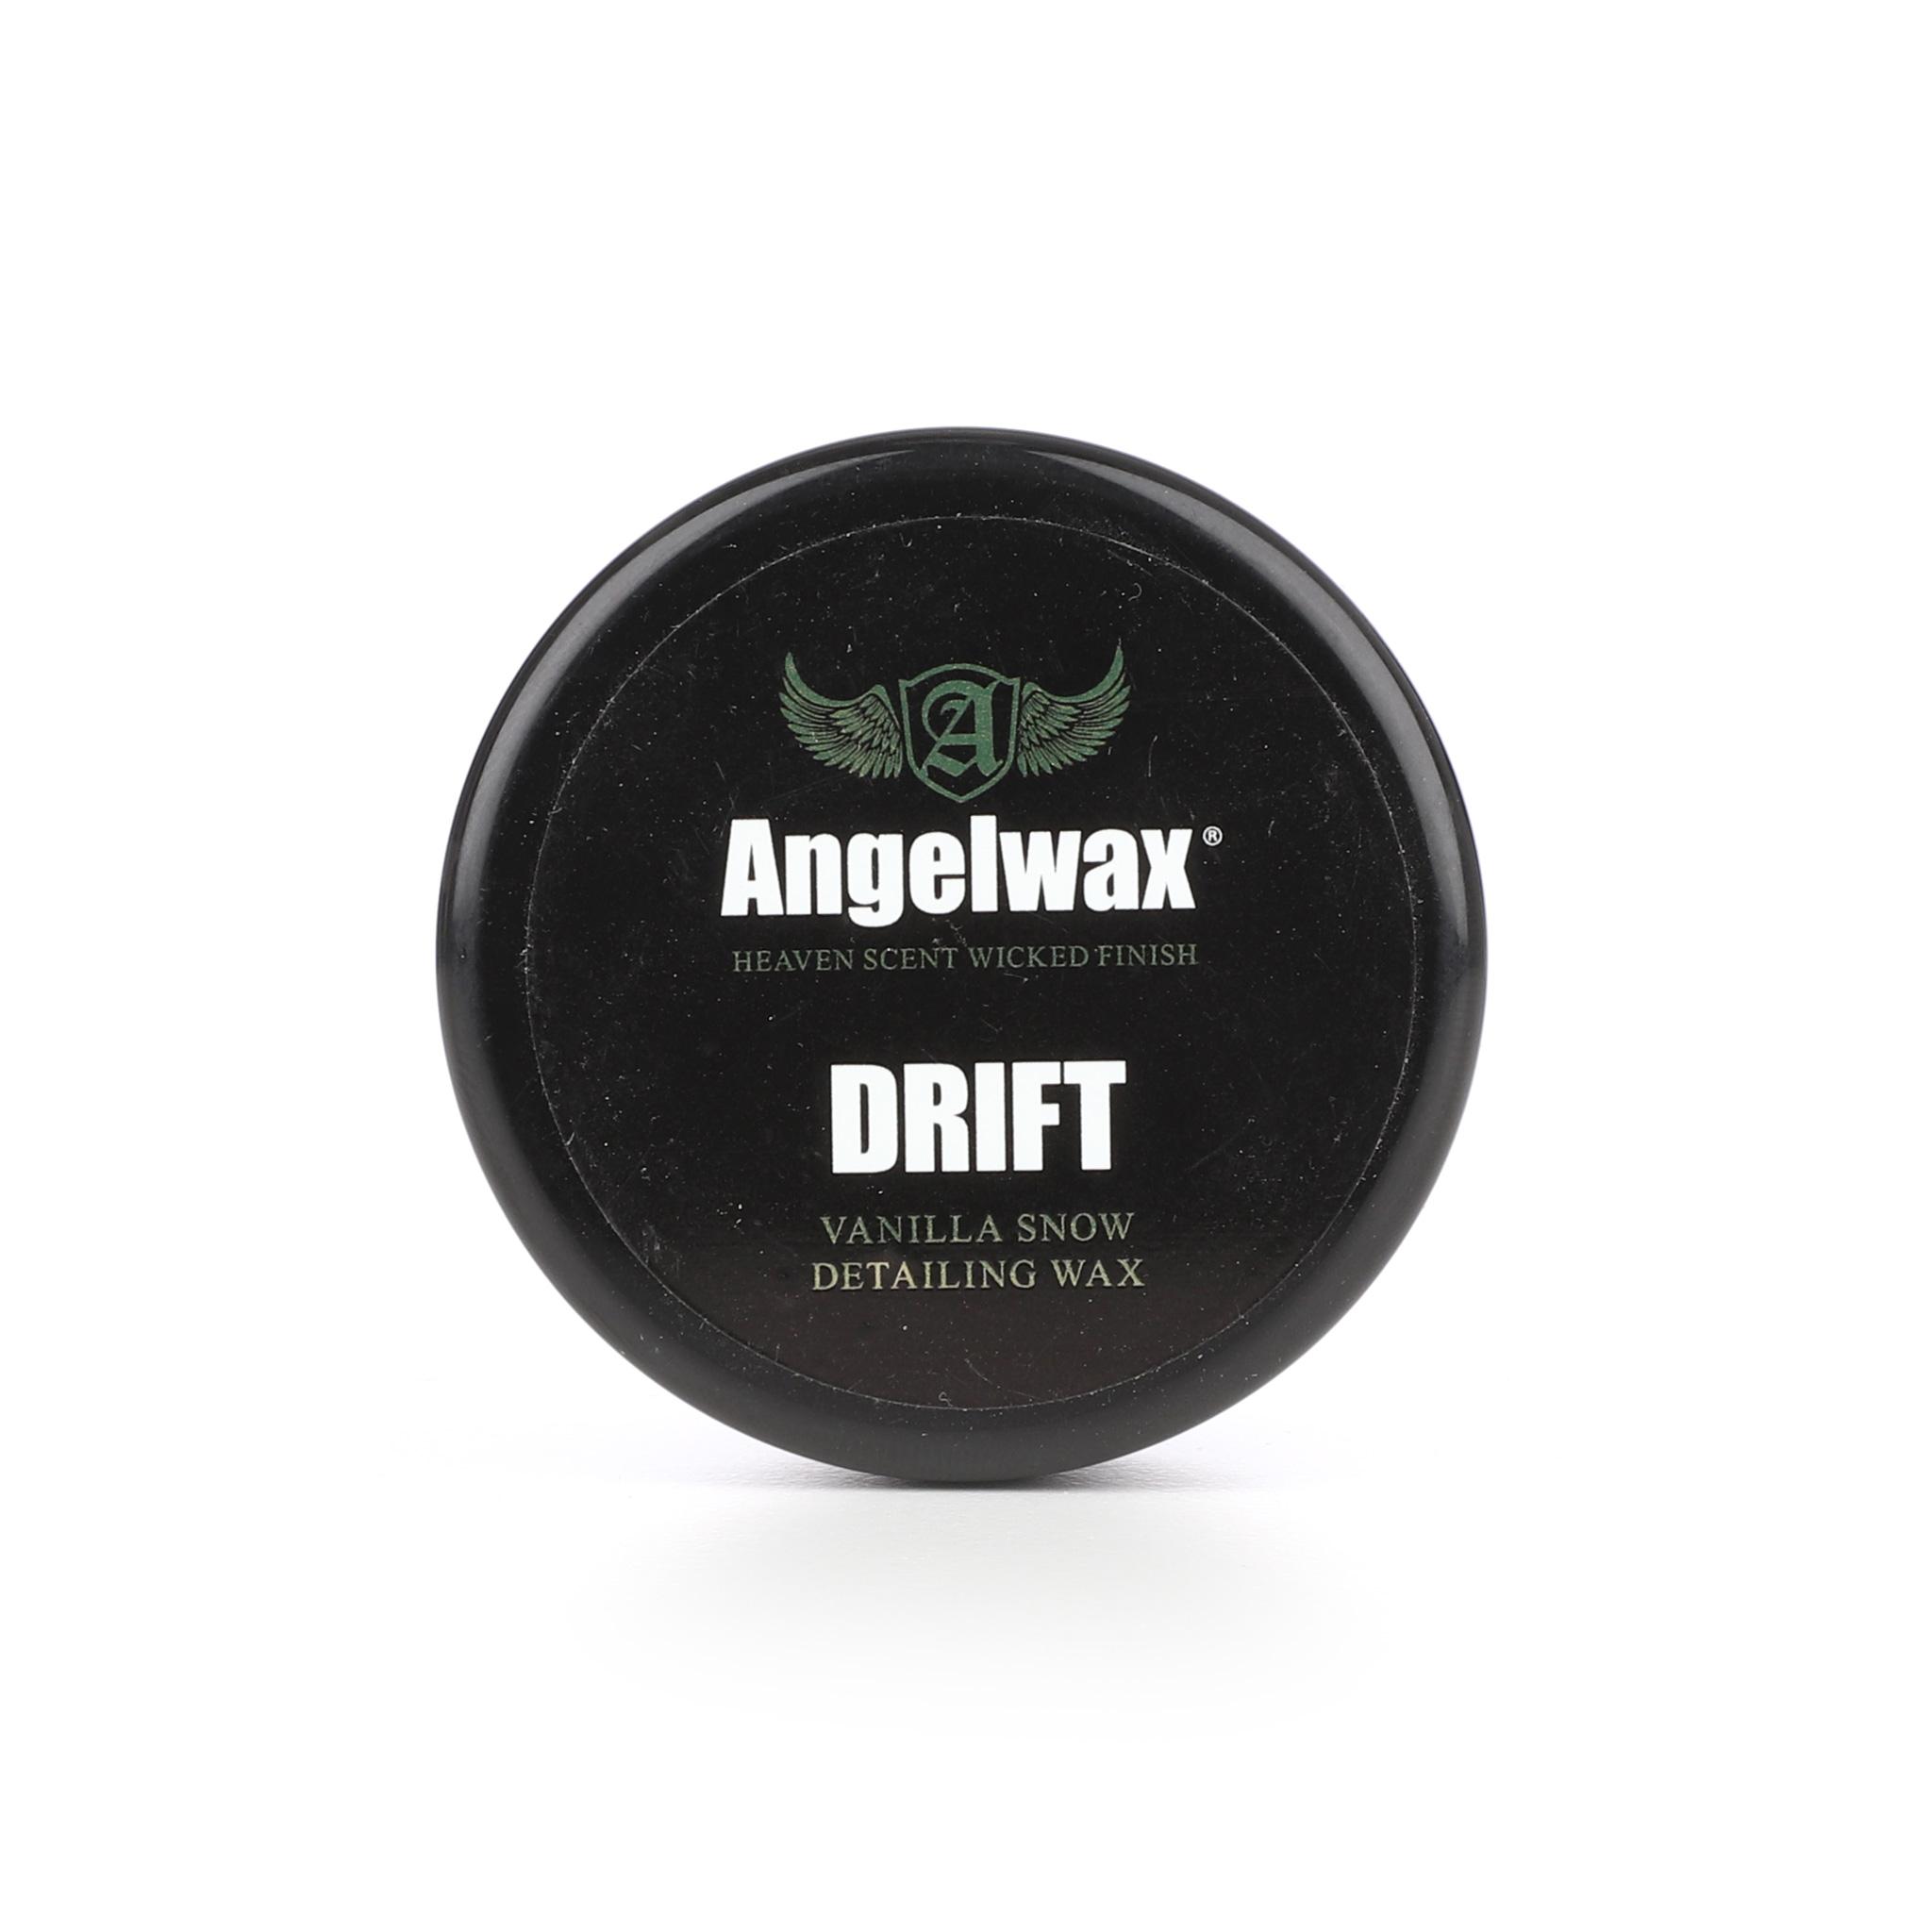 Bilvax Angelwax Drift, 33 ml, Endast vax